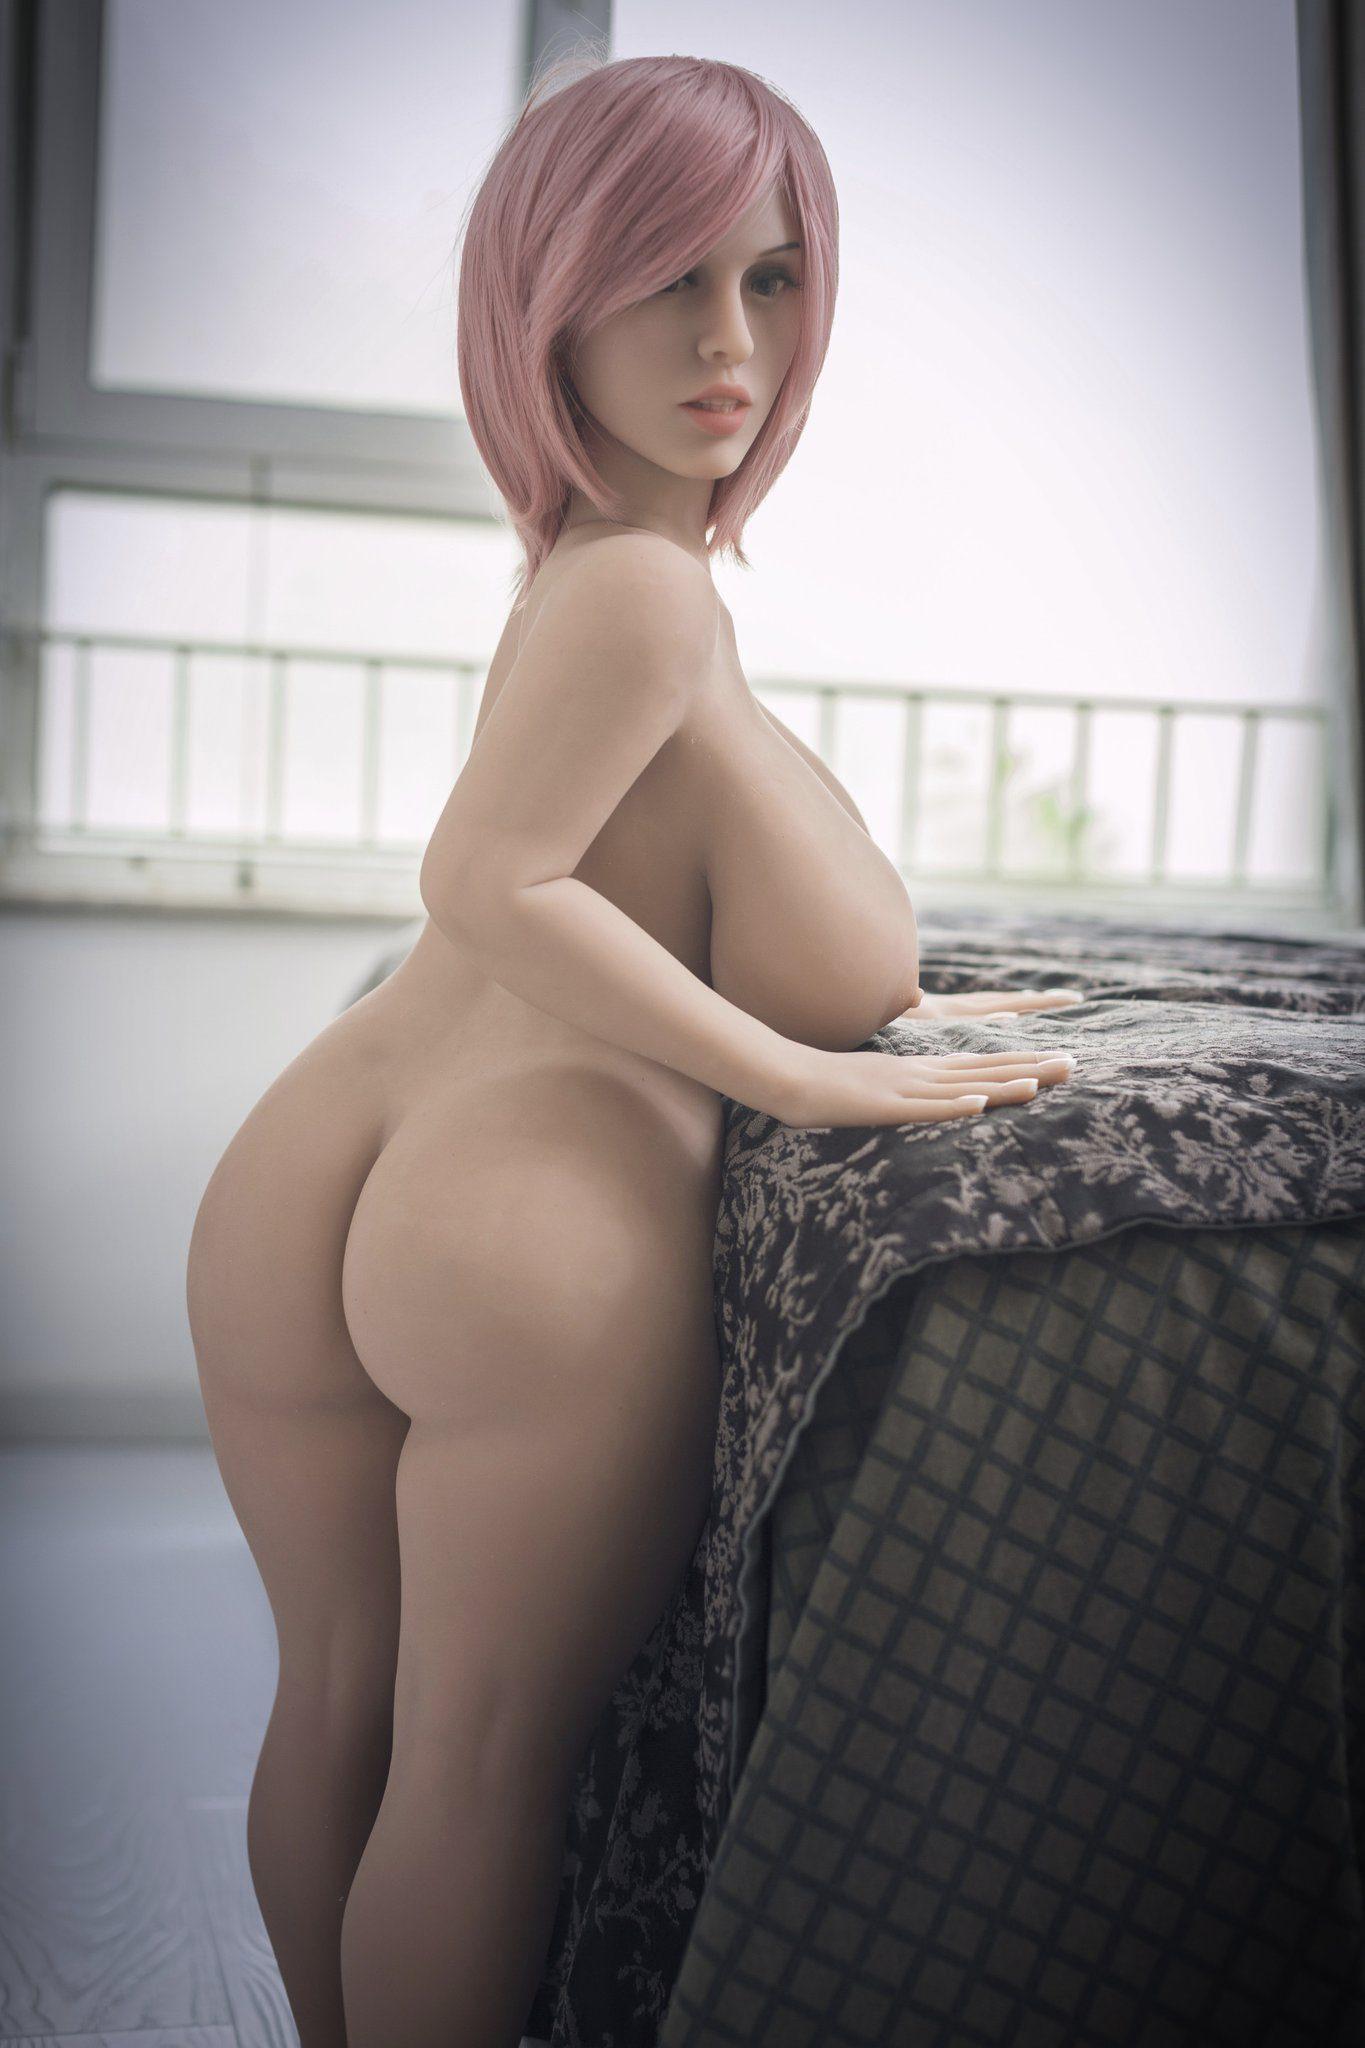 Small Realistic Sex Doll   Midget Vagina   108 cm